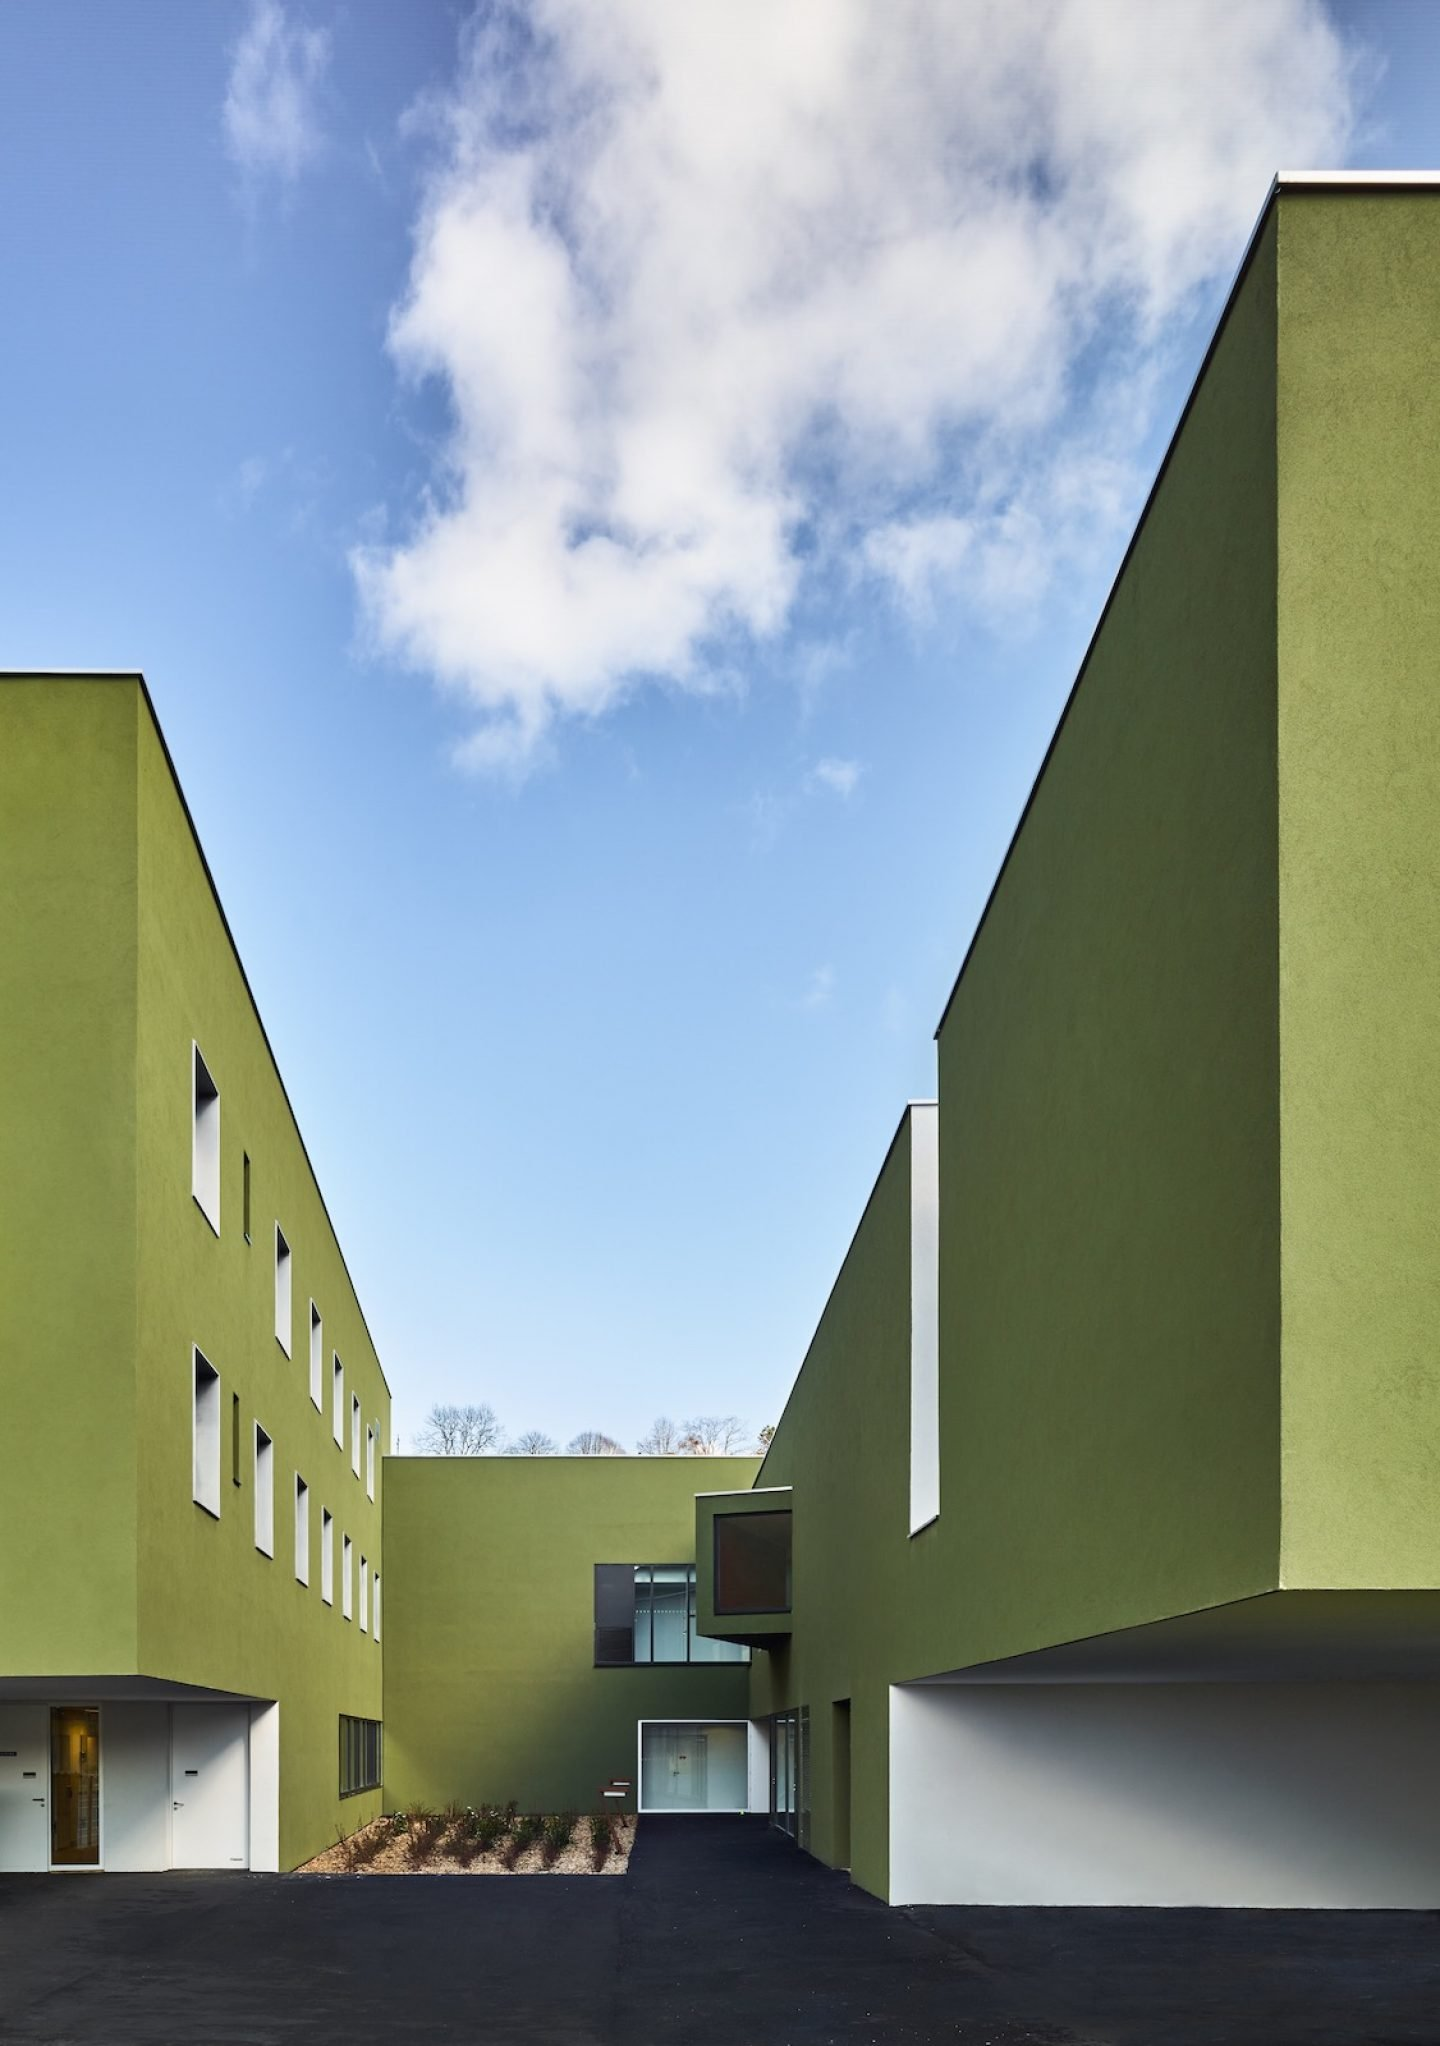 architecture_orbec_dominiquecoulon_associesarchitectes_17